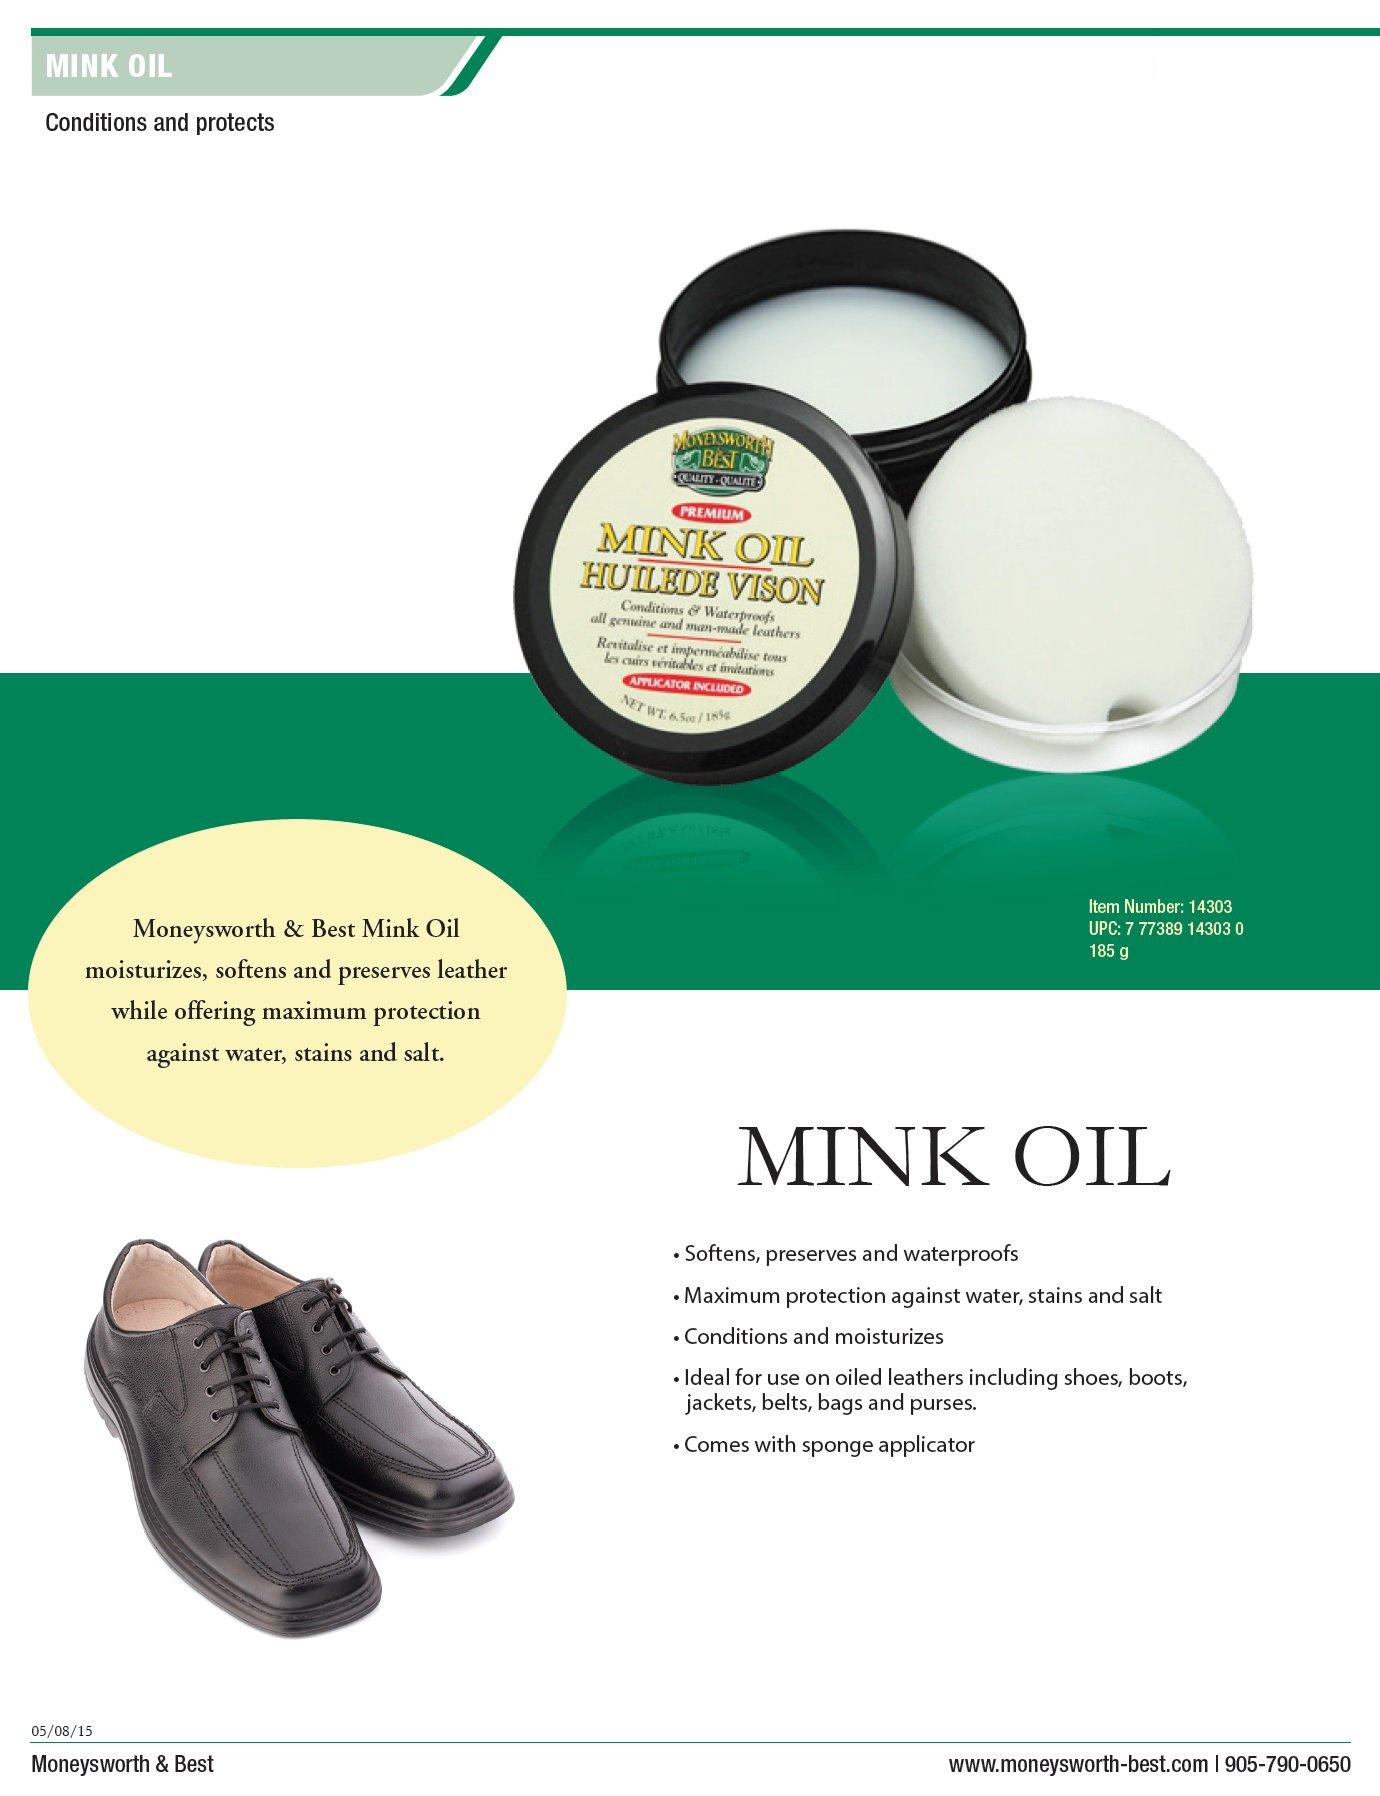 Moneysworth & Best Mink Oil-Tub (6.5-Ounces)